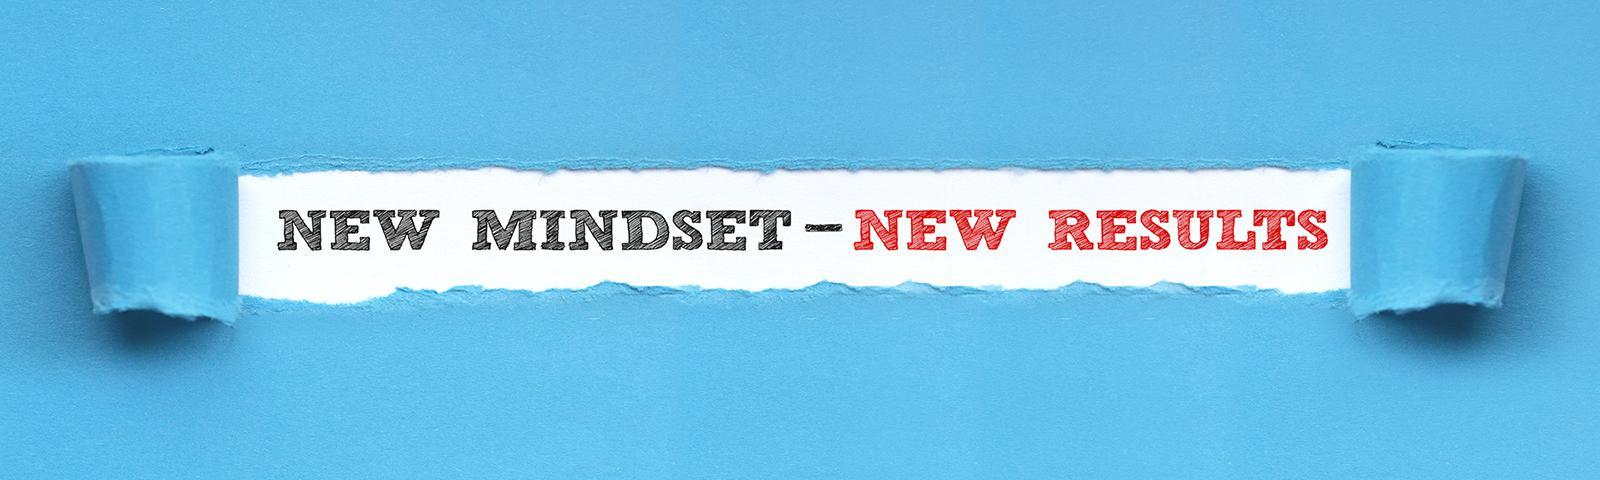 Mindset: Myth and Business Reality